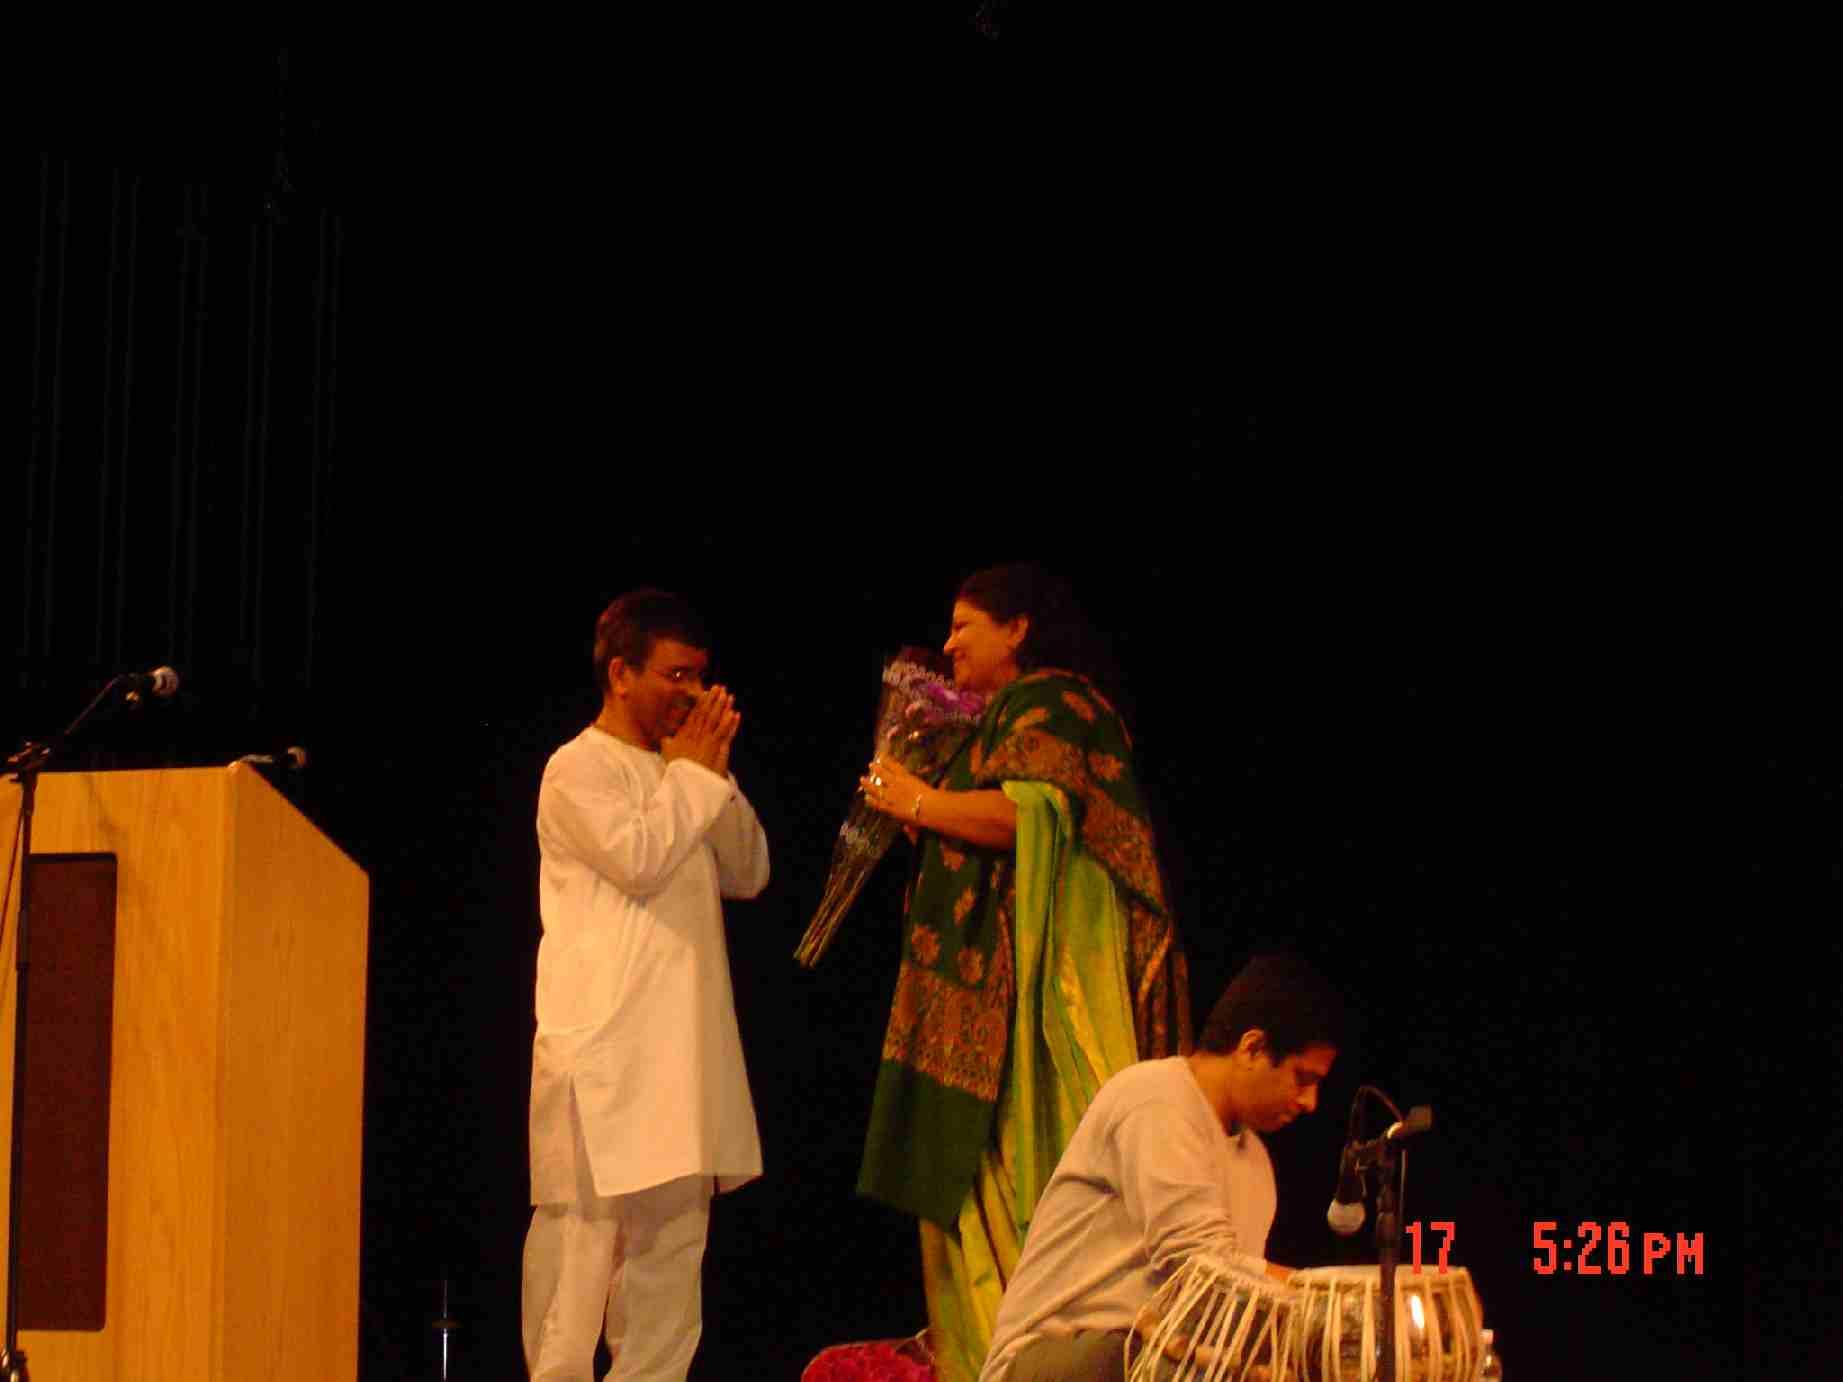 Soundraya Lahiri - Shobha Raju Concert